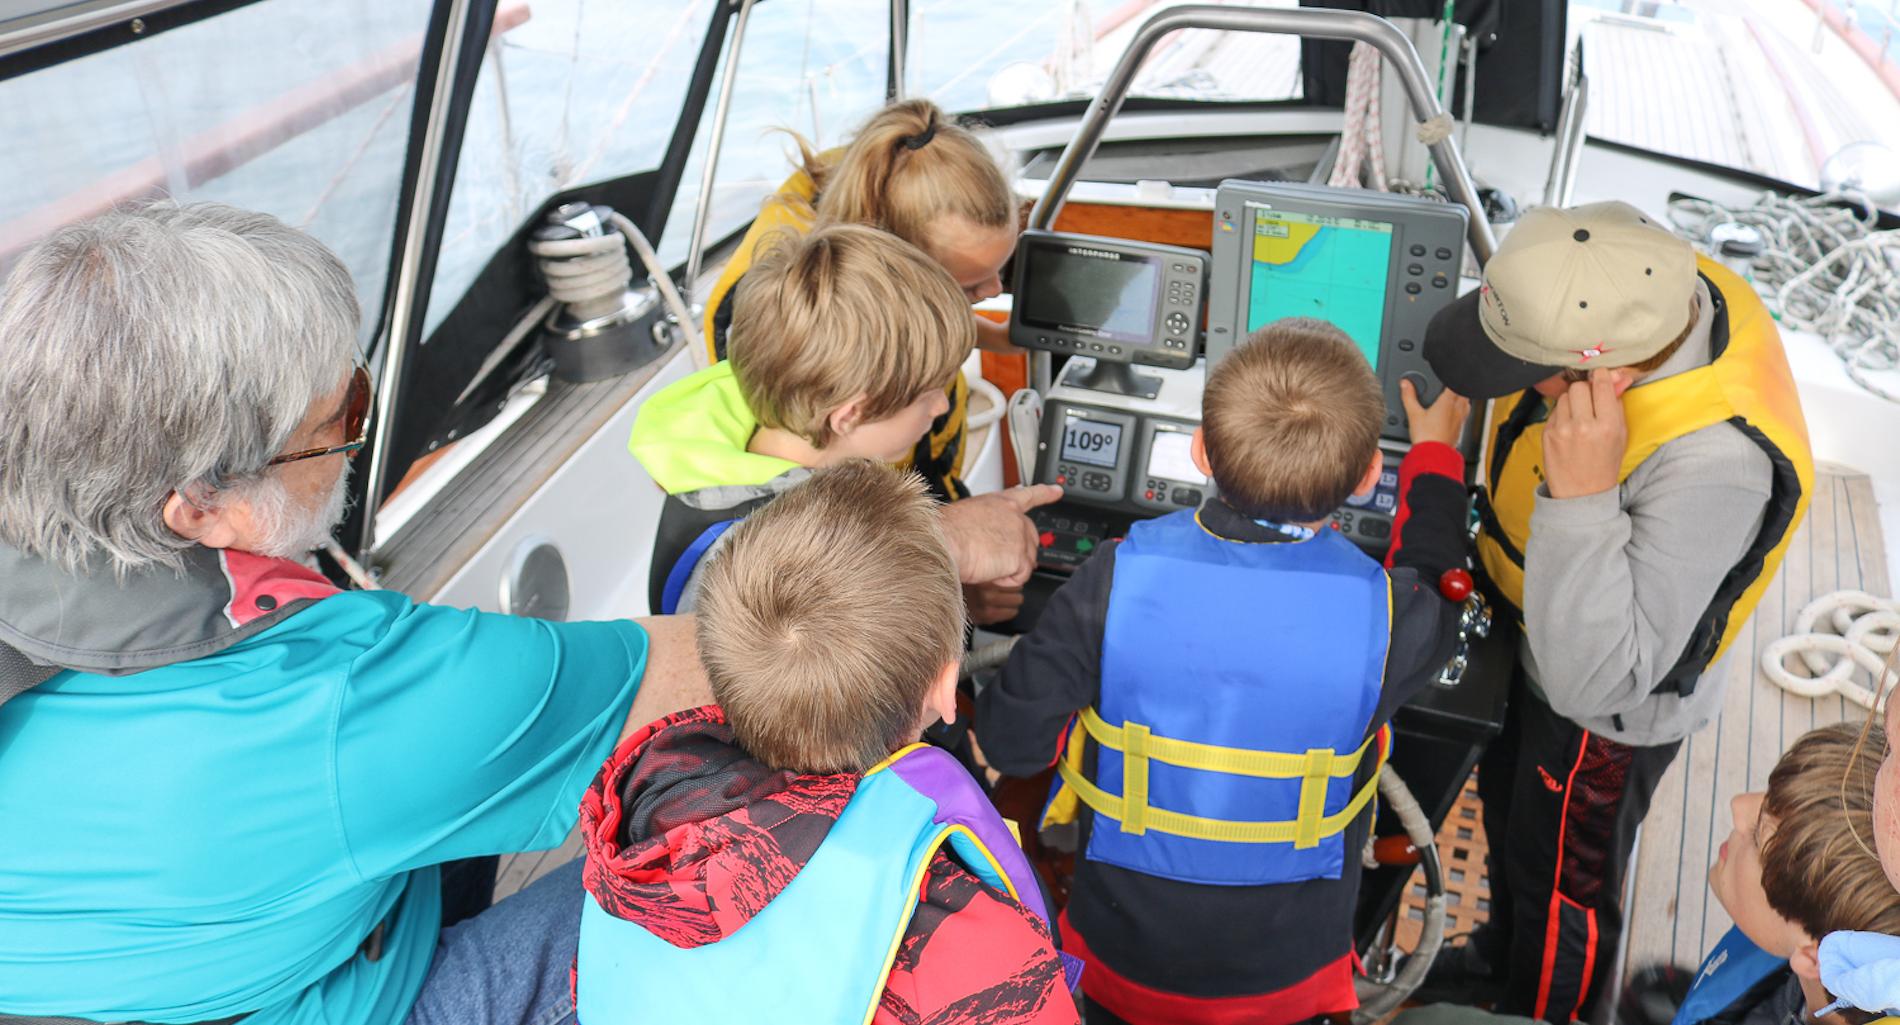 Gordy showing kids navigation 1900.png